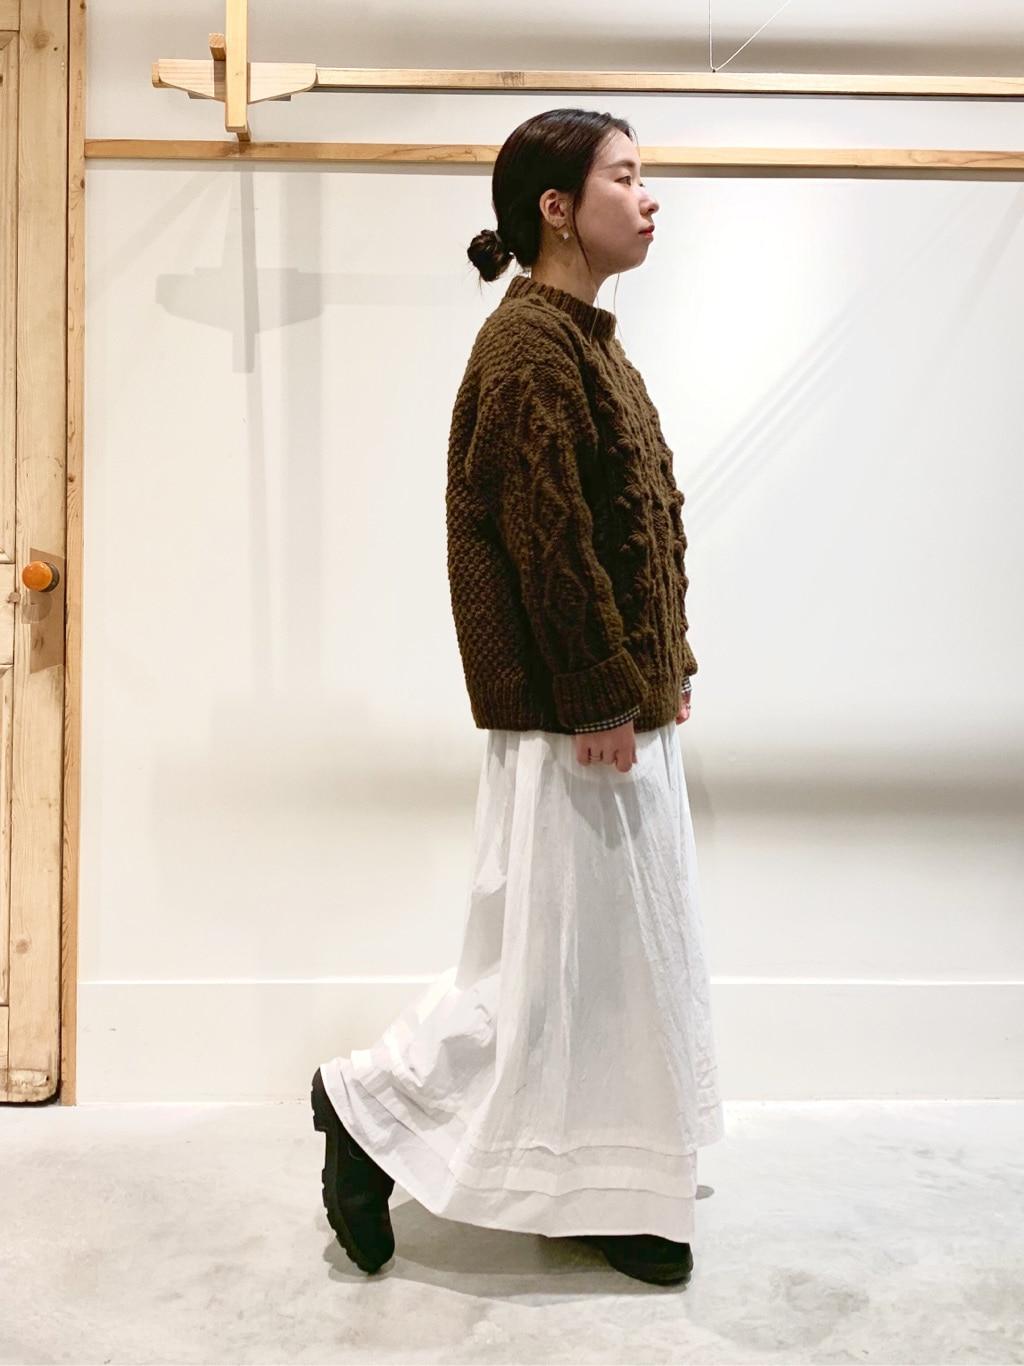 Malle chambre de charme 調布パルコ 身長:152cm 2020.10.13